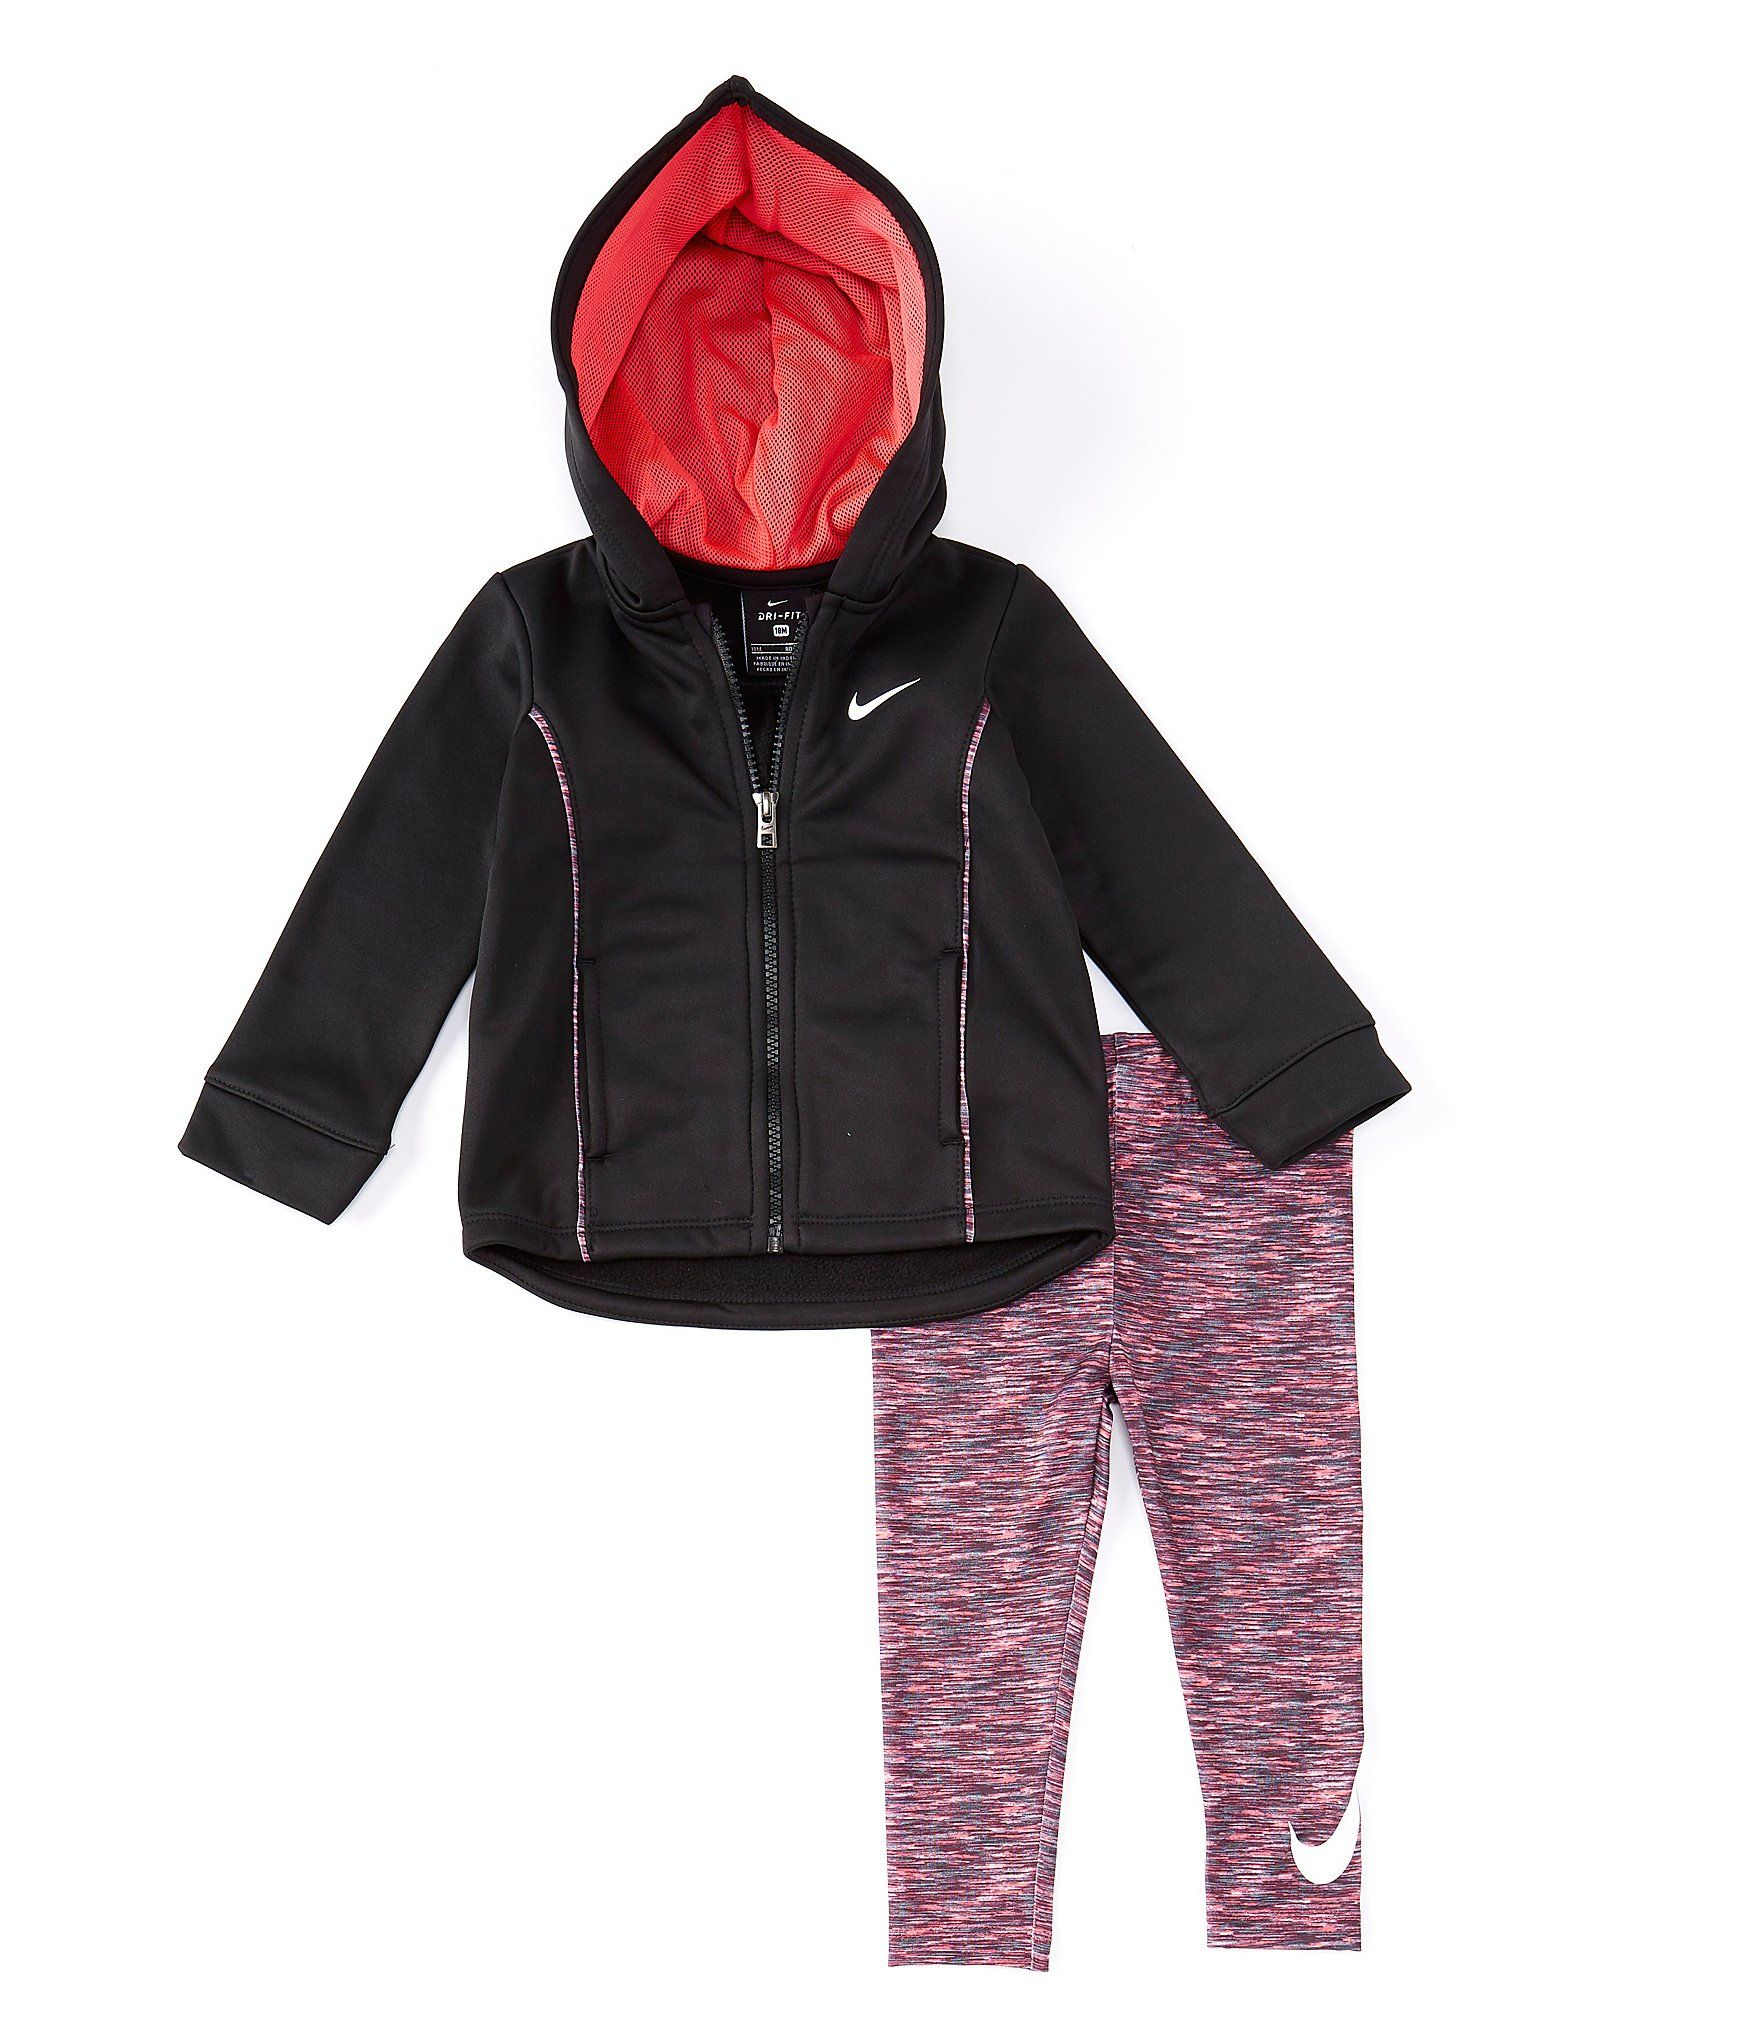 Adidas Baby ADIDAS Camouflage Winter Jacket 24 Months | eBay